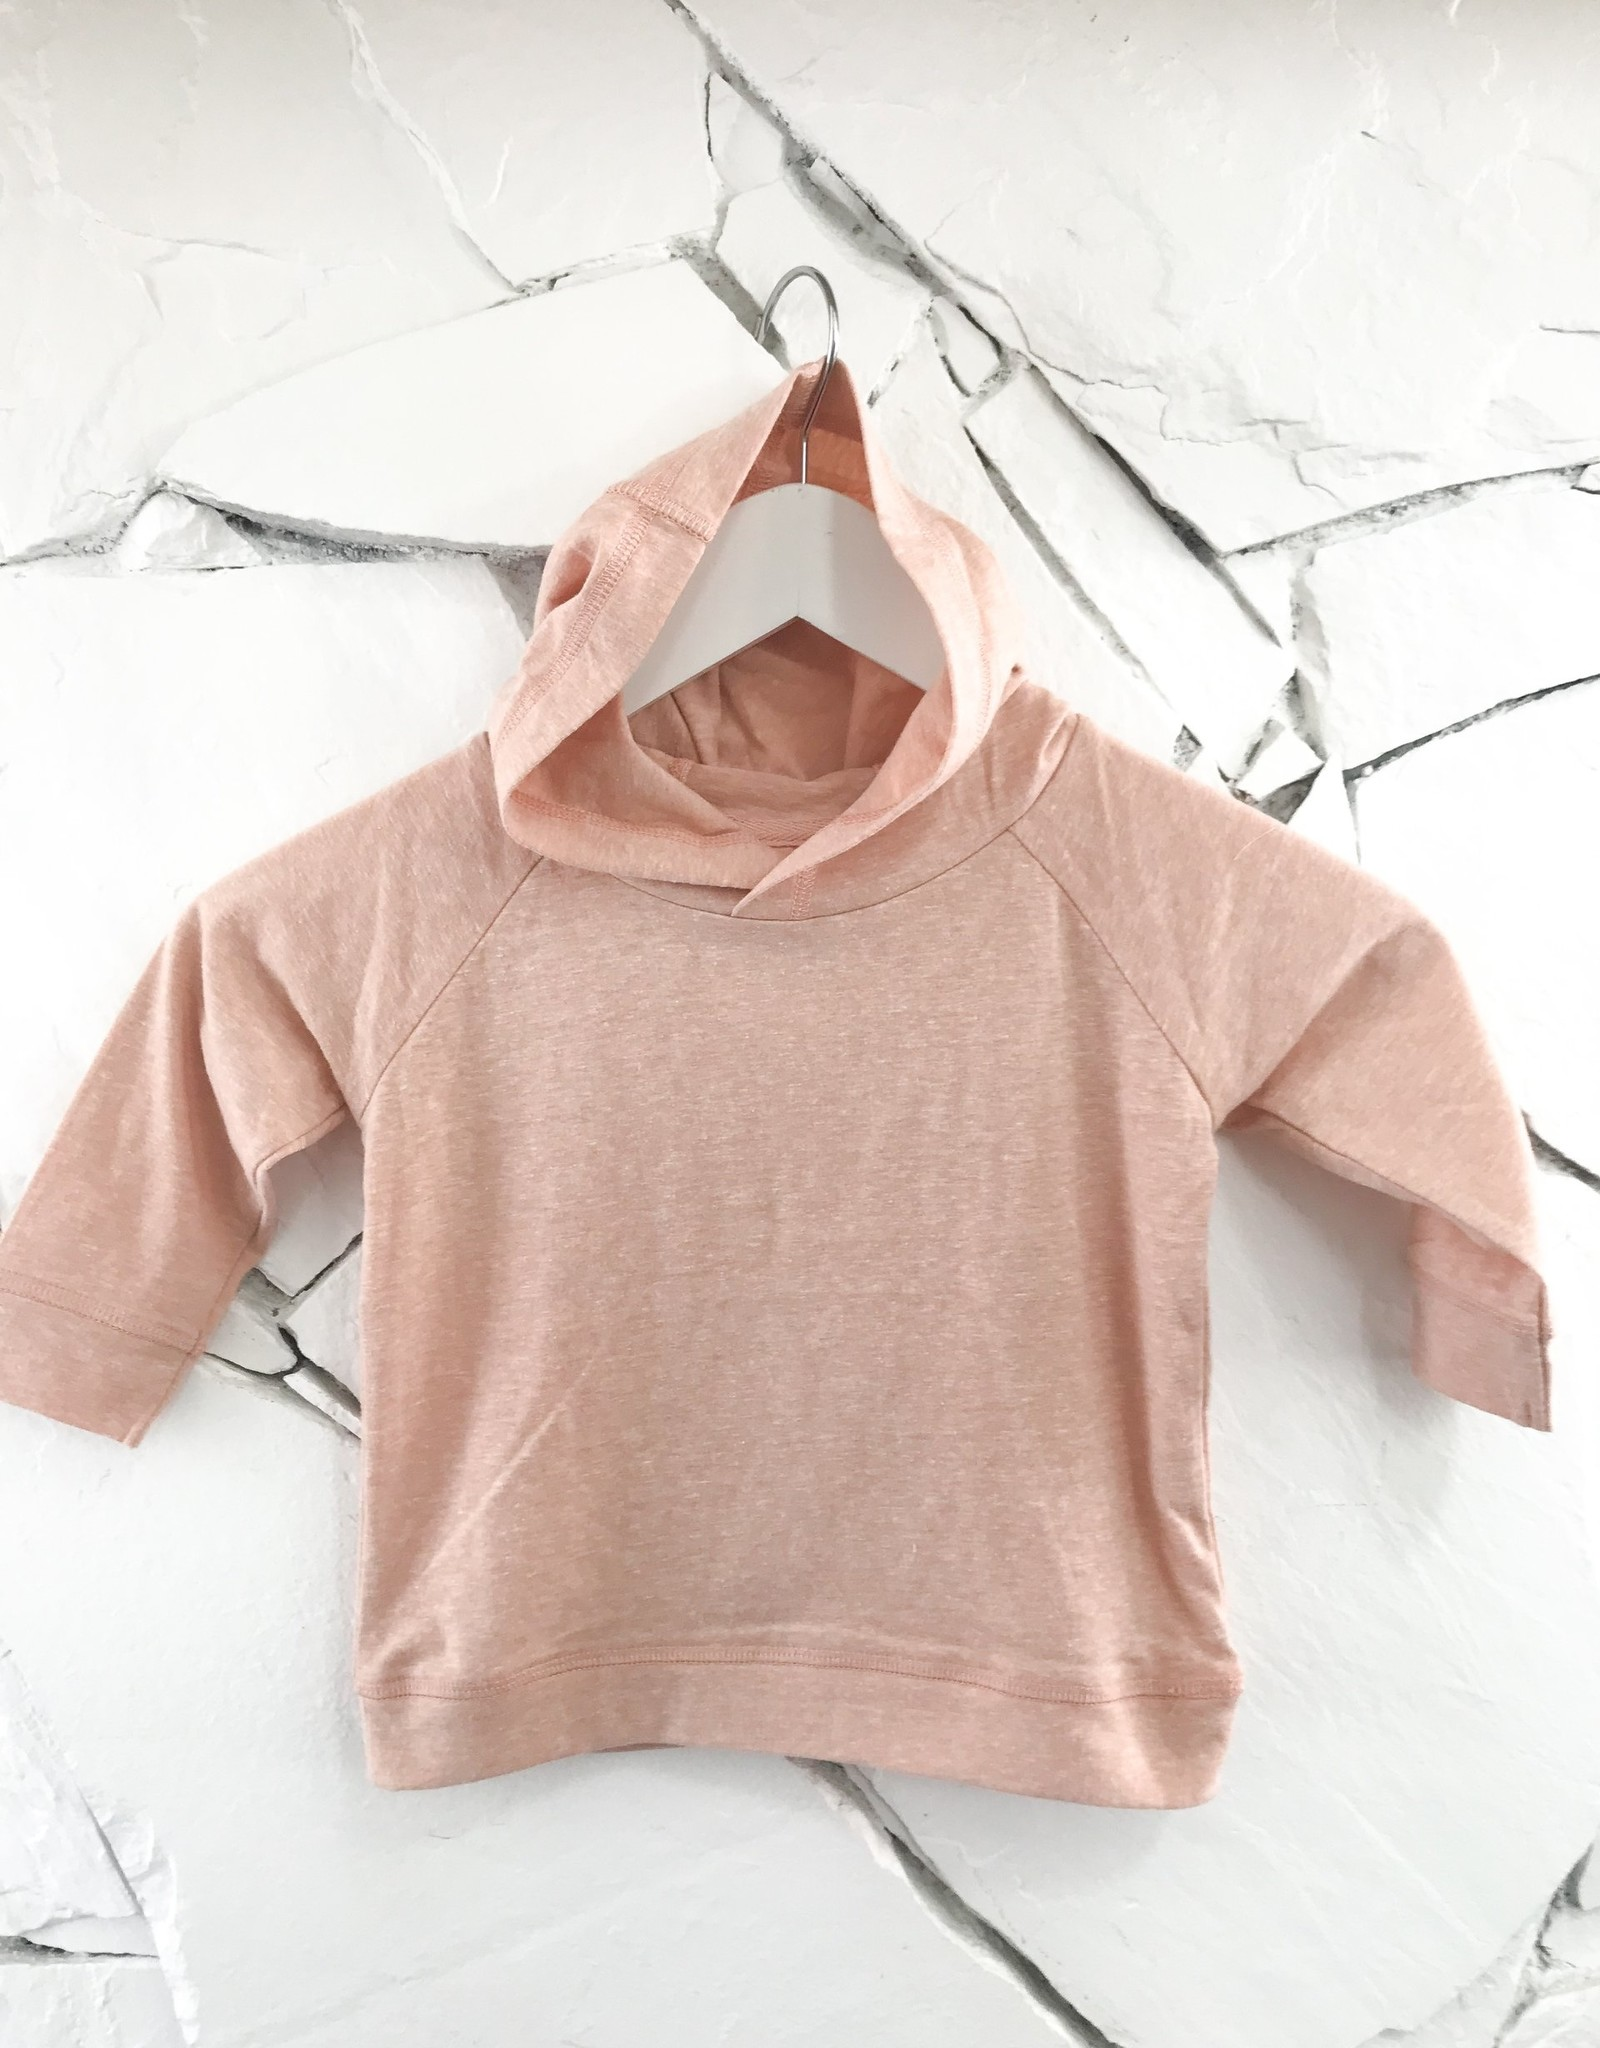 Little Rowe Sunny Hoodie - Grey, Peach, or CInnamon